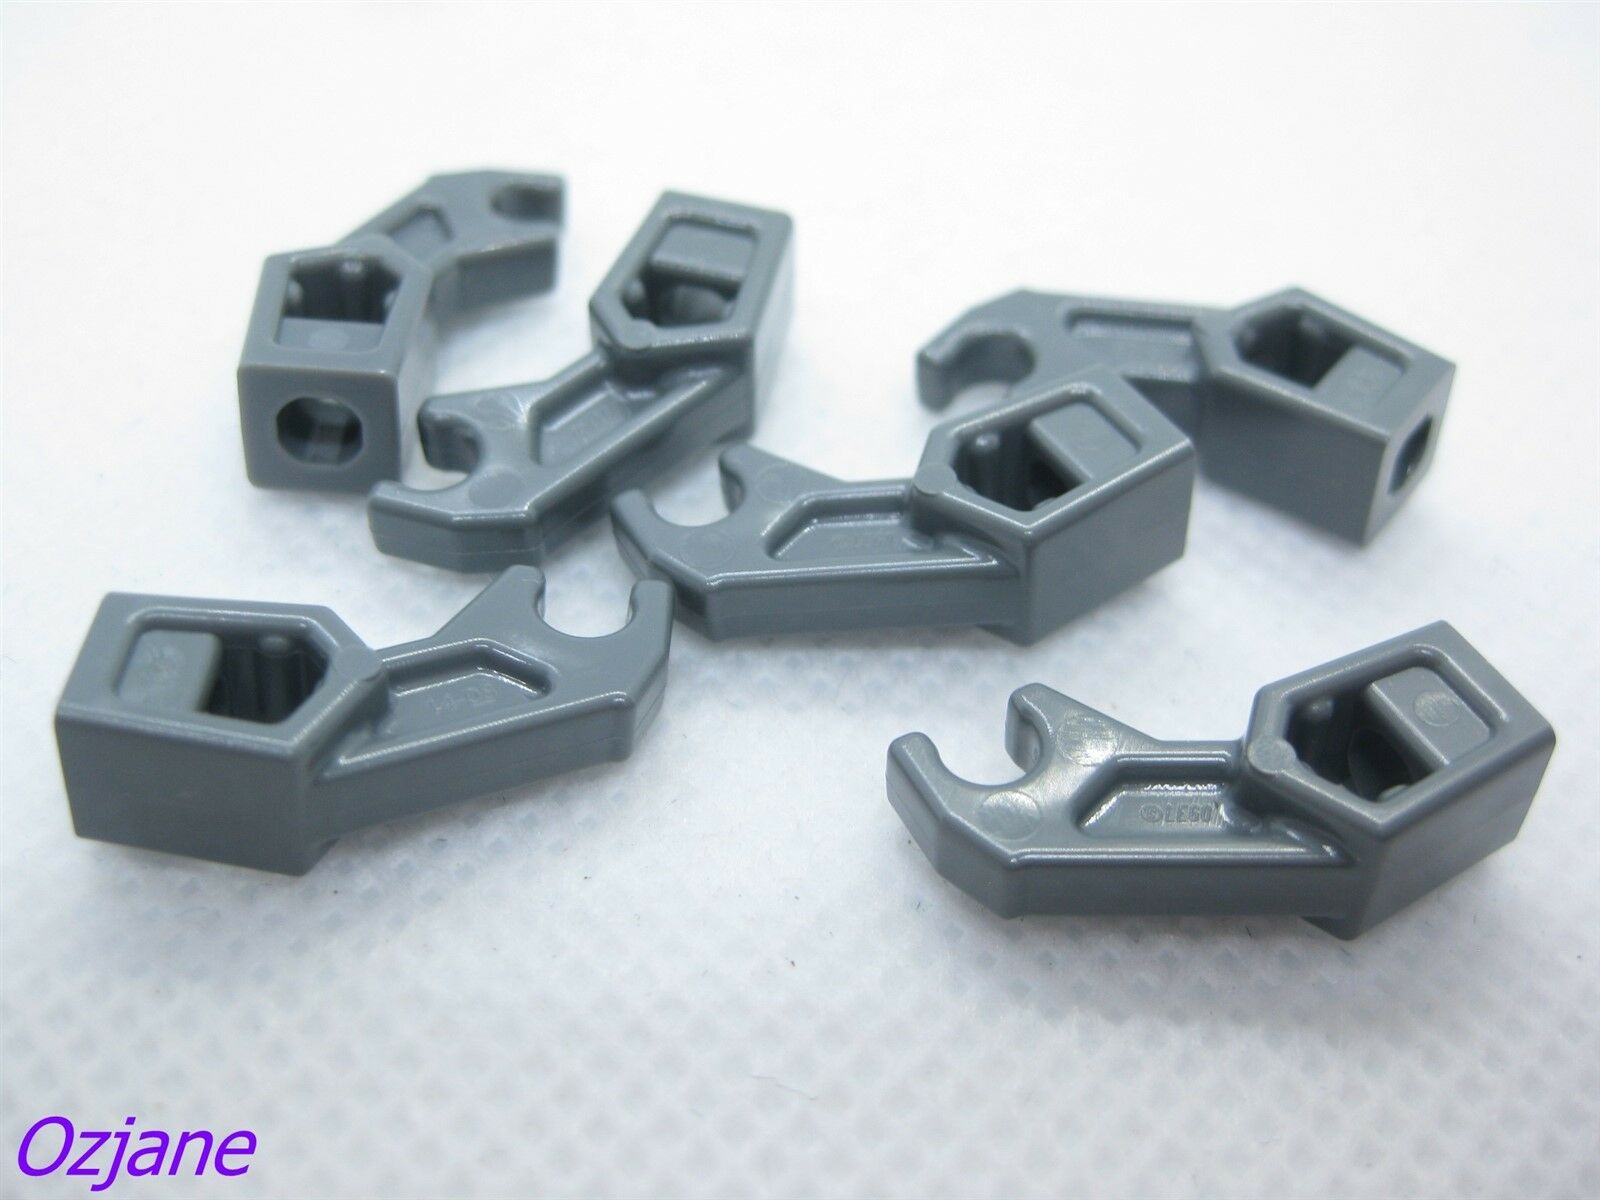 DARK BLUISH GREY ⭐️1 x NEW LEGO x77cc150 STRING CORD MEDIUM 6219044⭐️